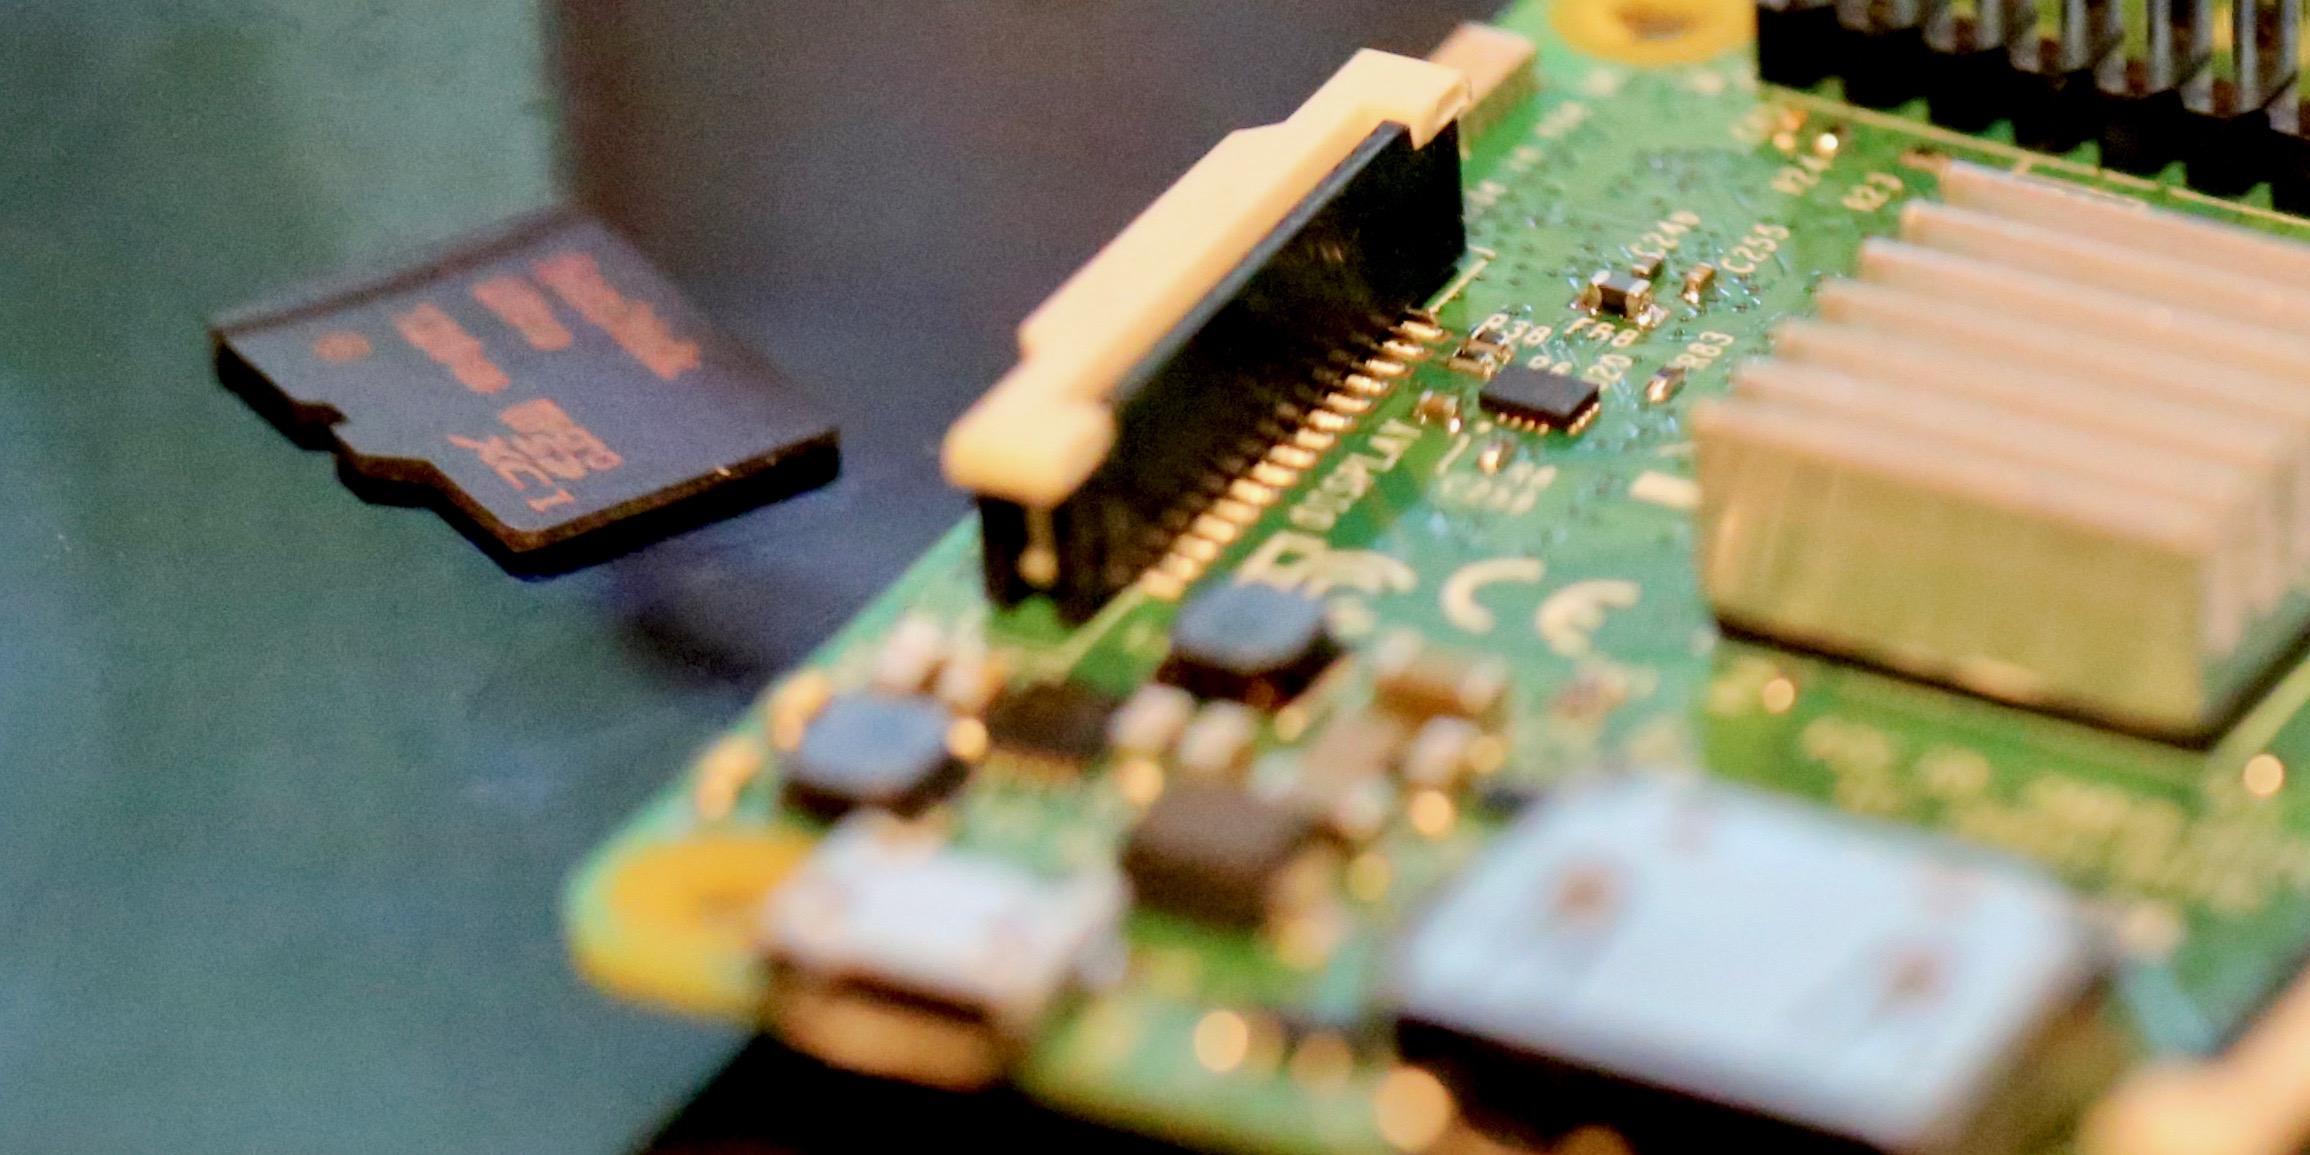 Raspberry Pi 3 microSD Card